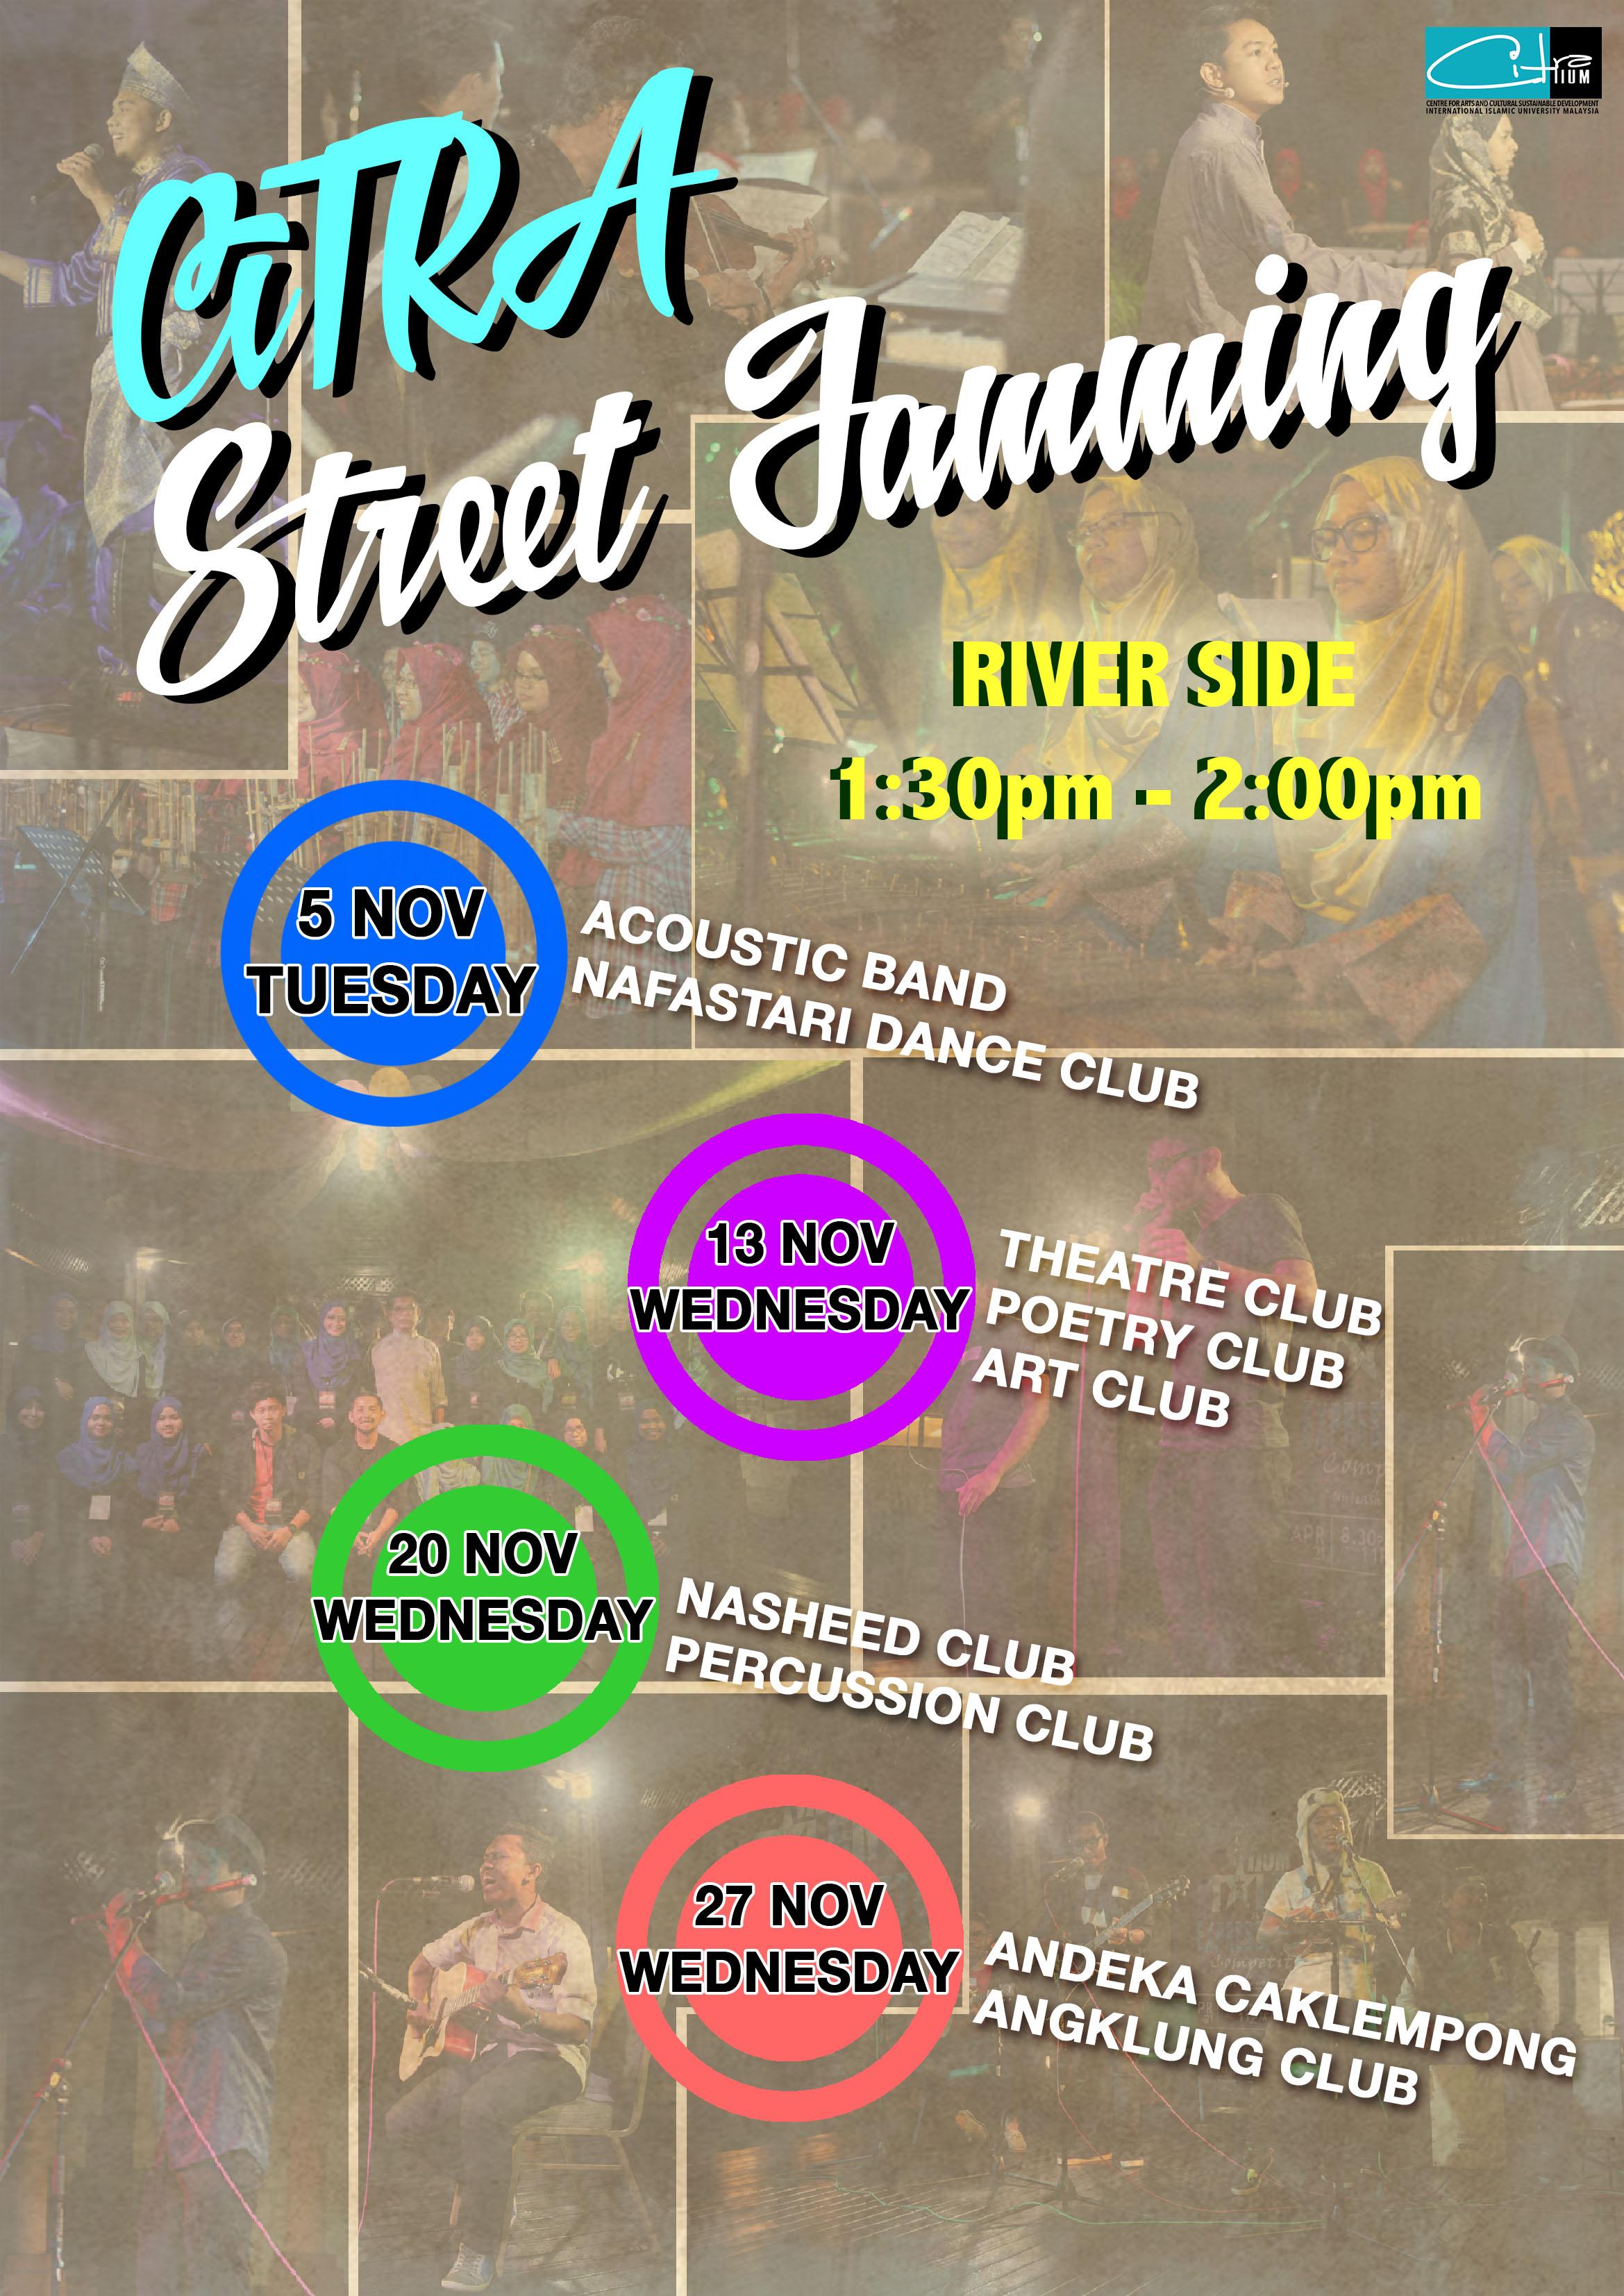 CiTRA Street Jamming